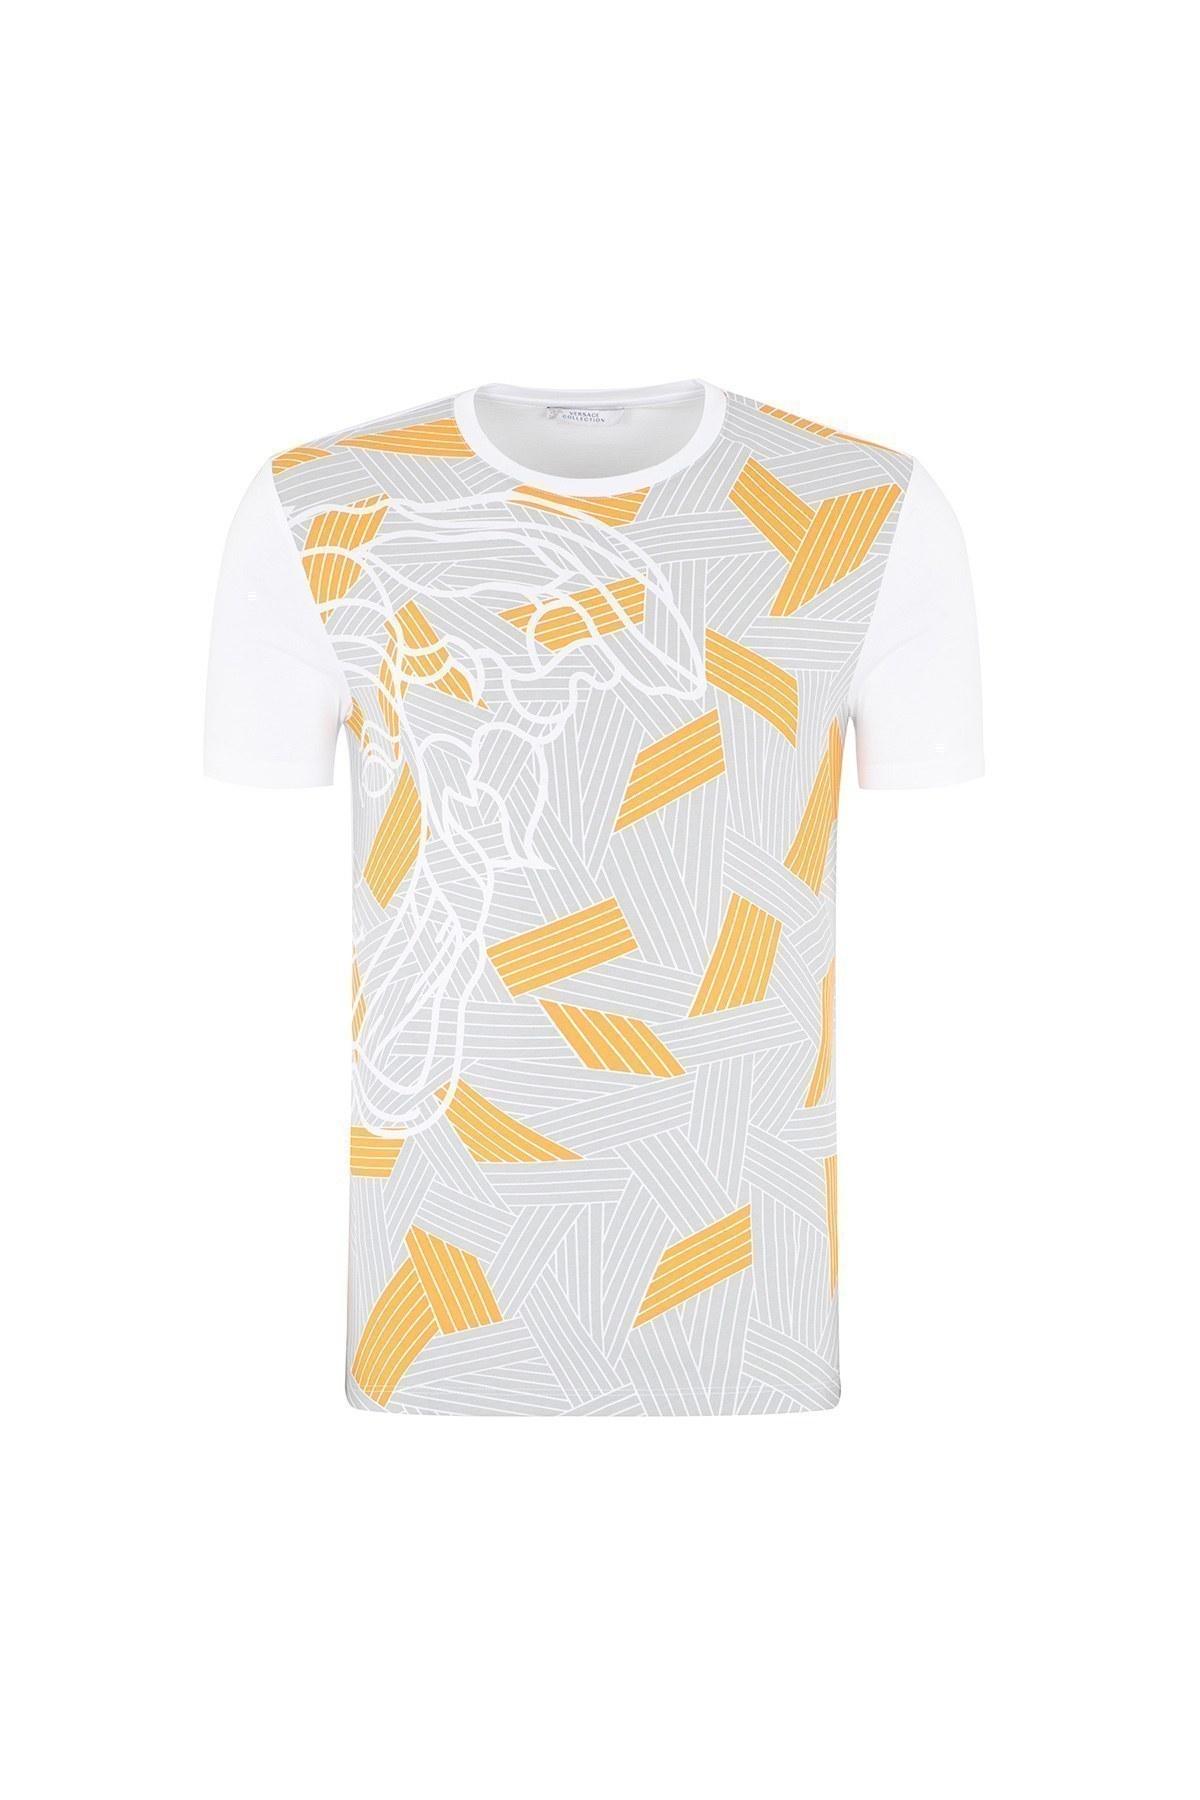 VERSACE COLLECTION T SHIRT Erkek T Shirt V800683S VJ00496 V1001 BEYAZ